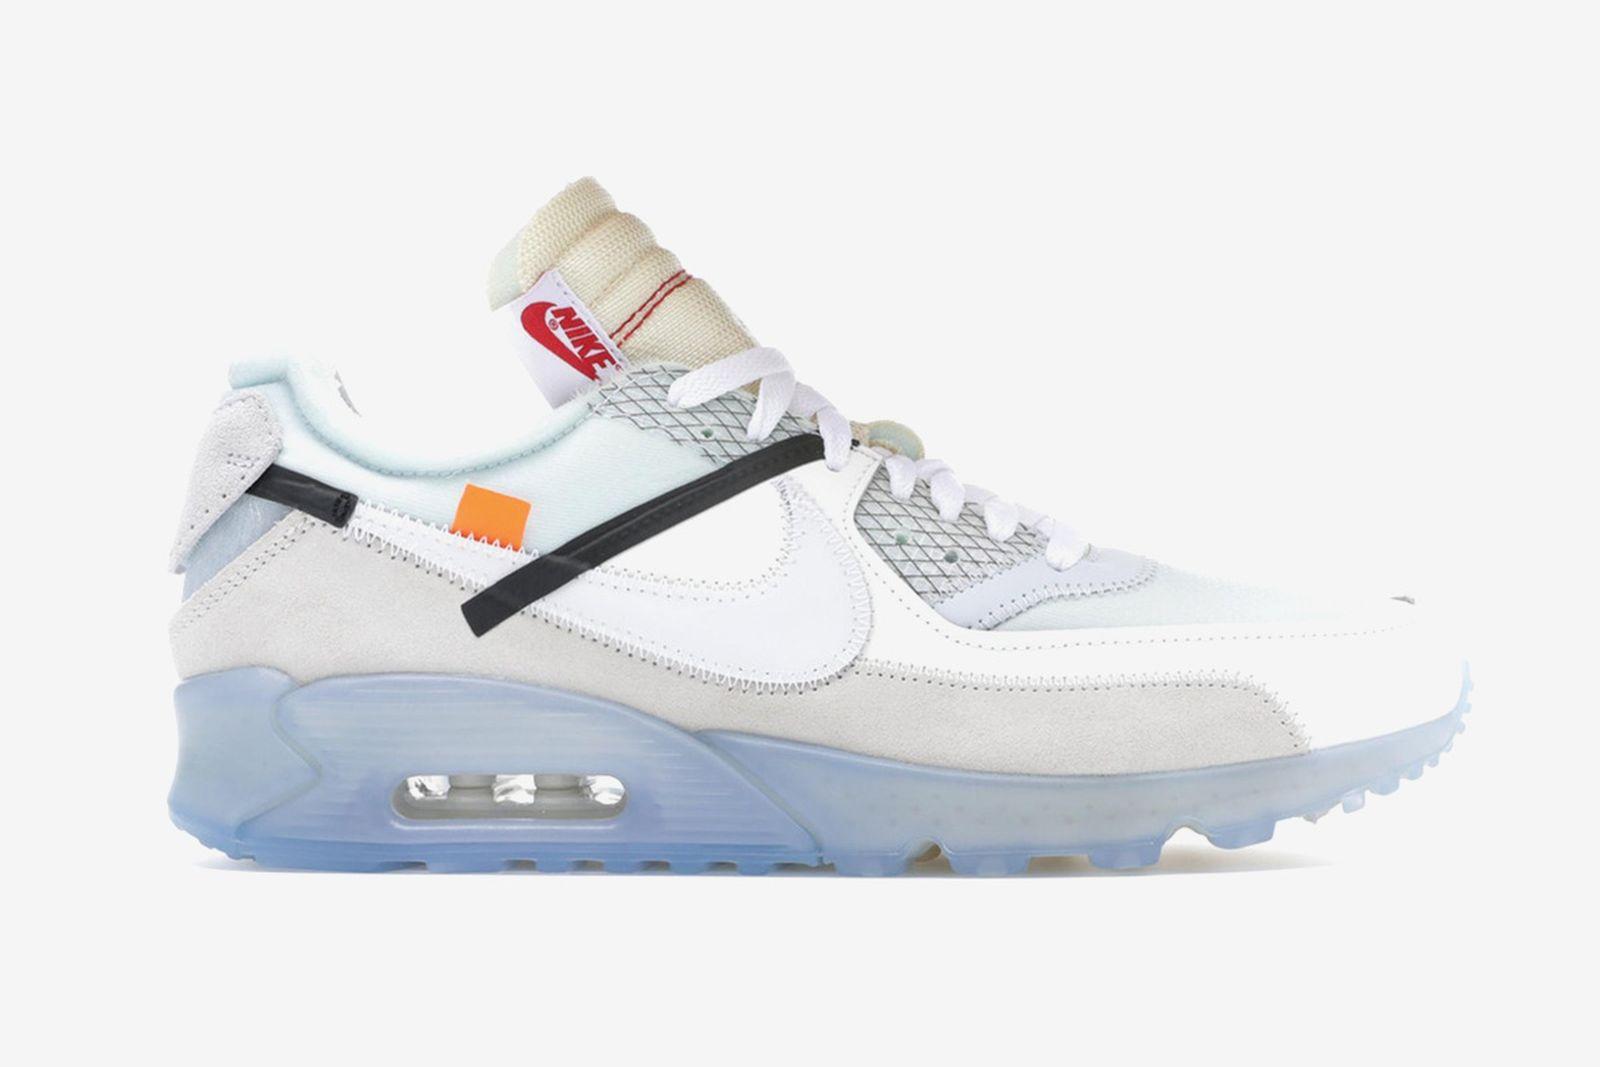 air max 90 the ten GOAT Nike The Ten OFF-WHITE c/o Virgil Abloh